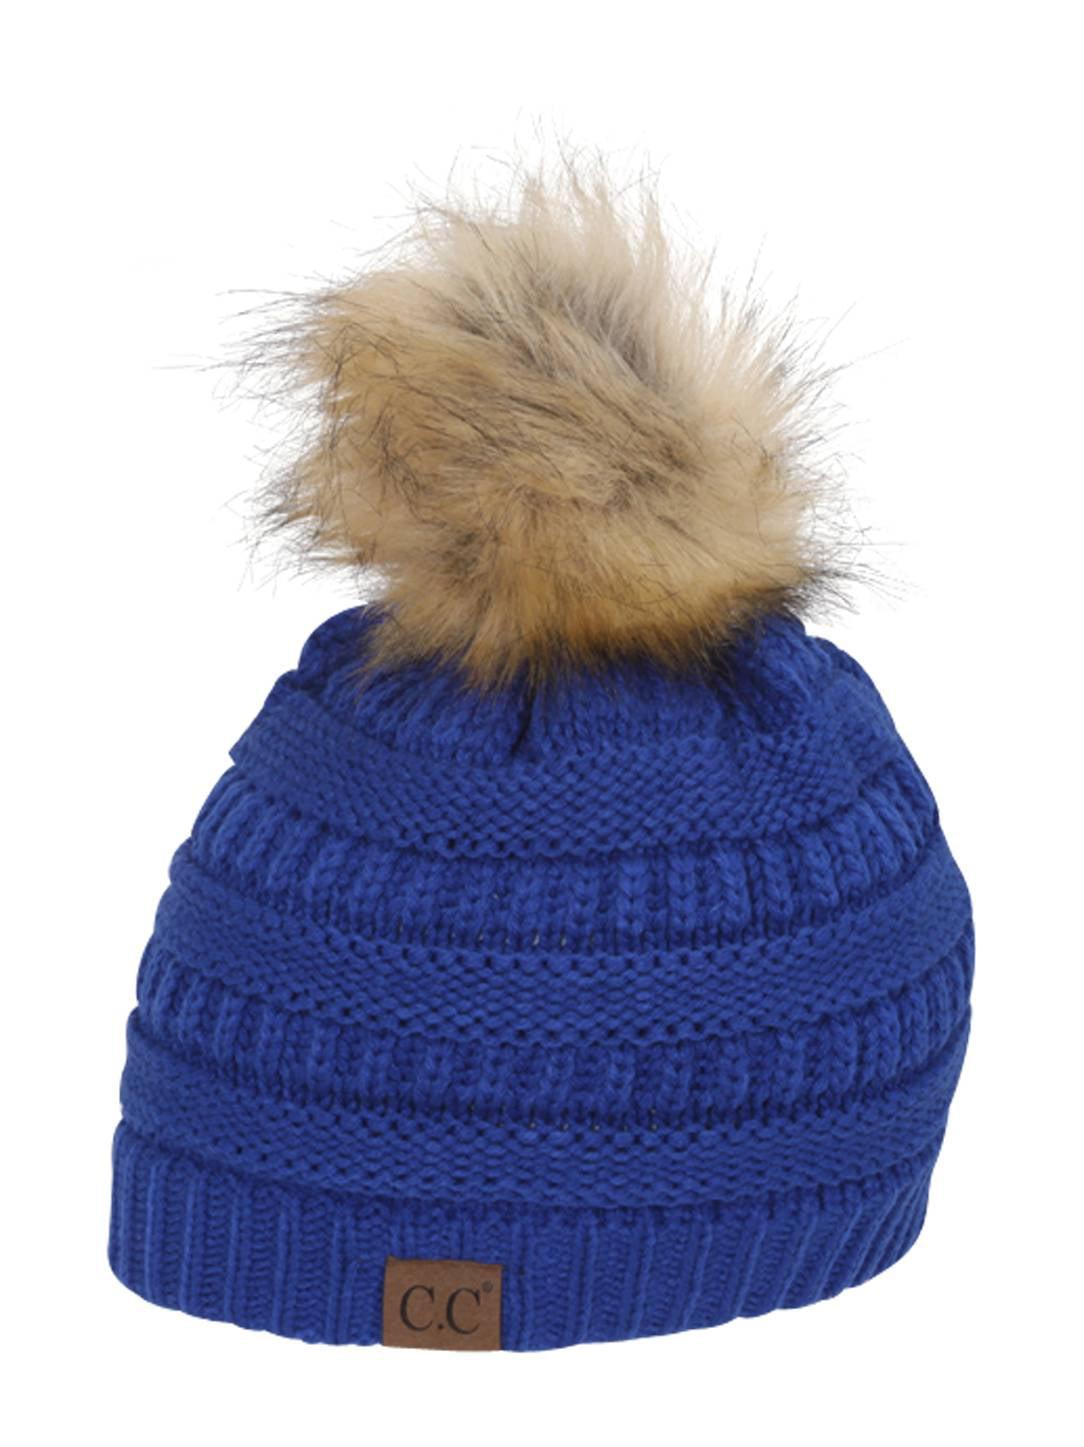 94519881f18 Gravity Threads Cable Knit Faux Fur Pom Pom Beanie Hat